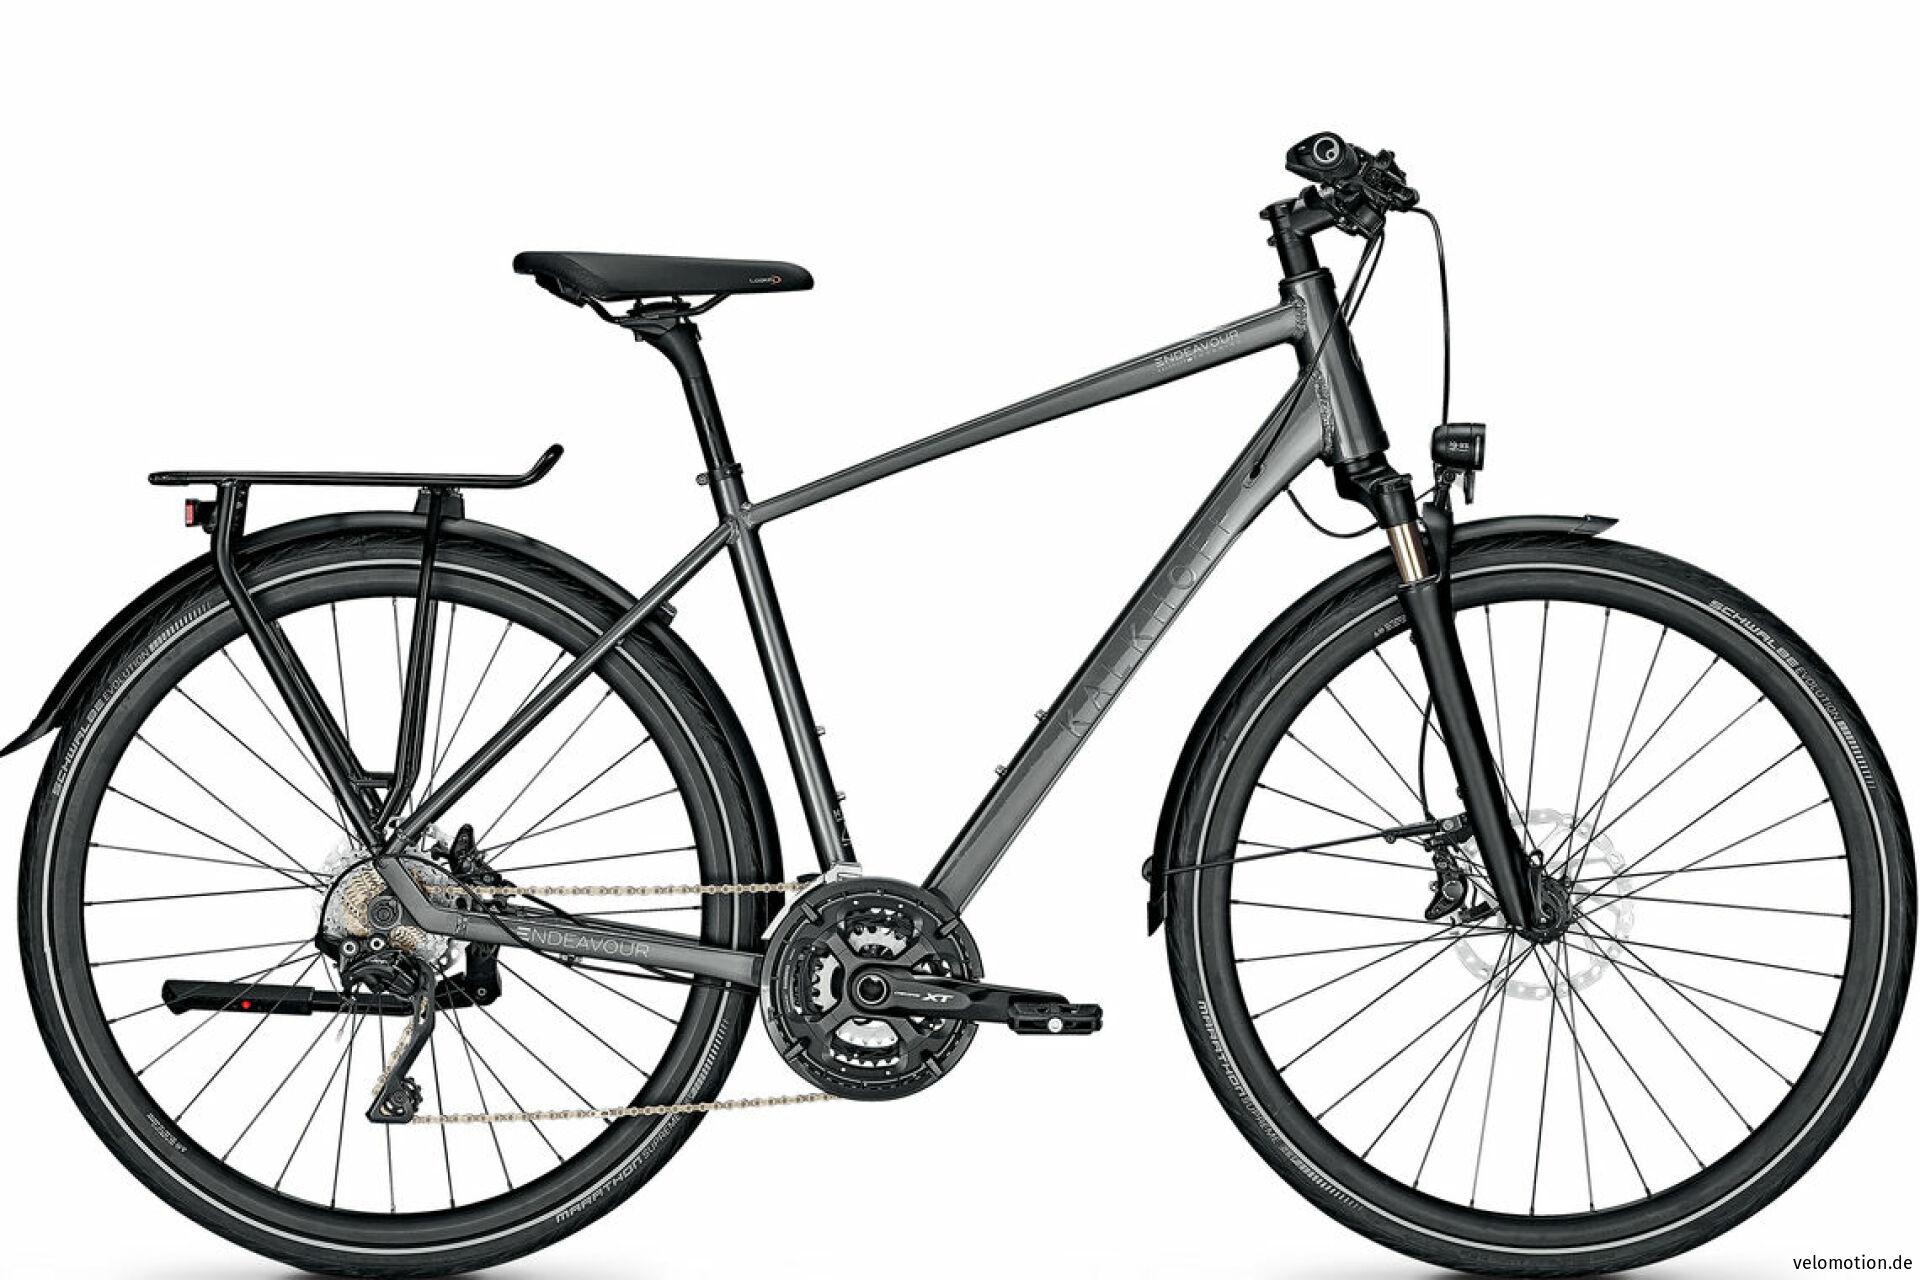 Endeavour Pro He50 grey #1